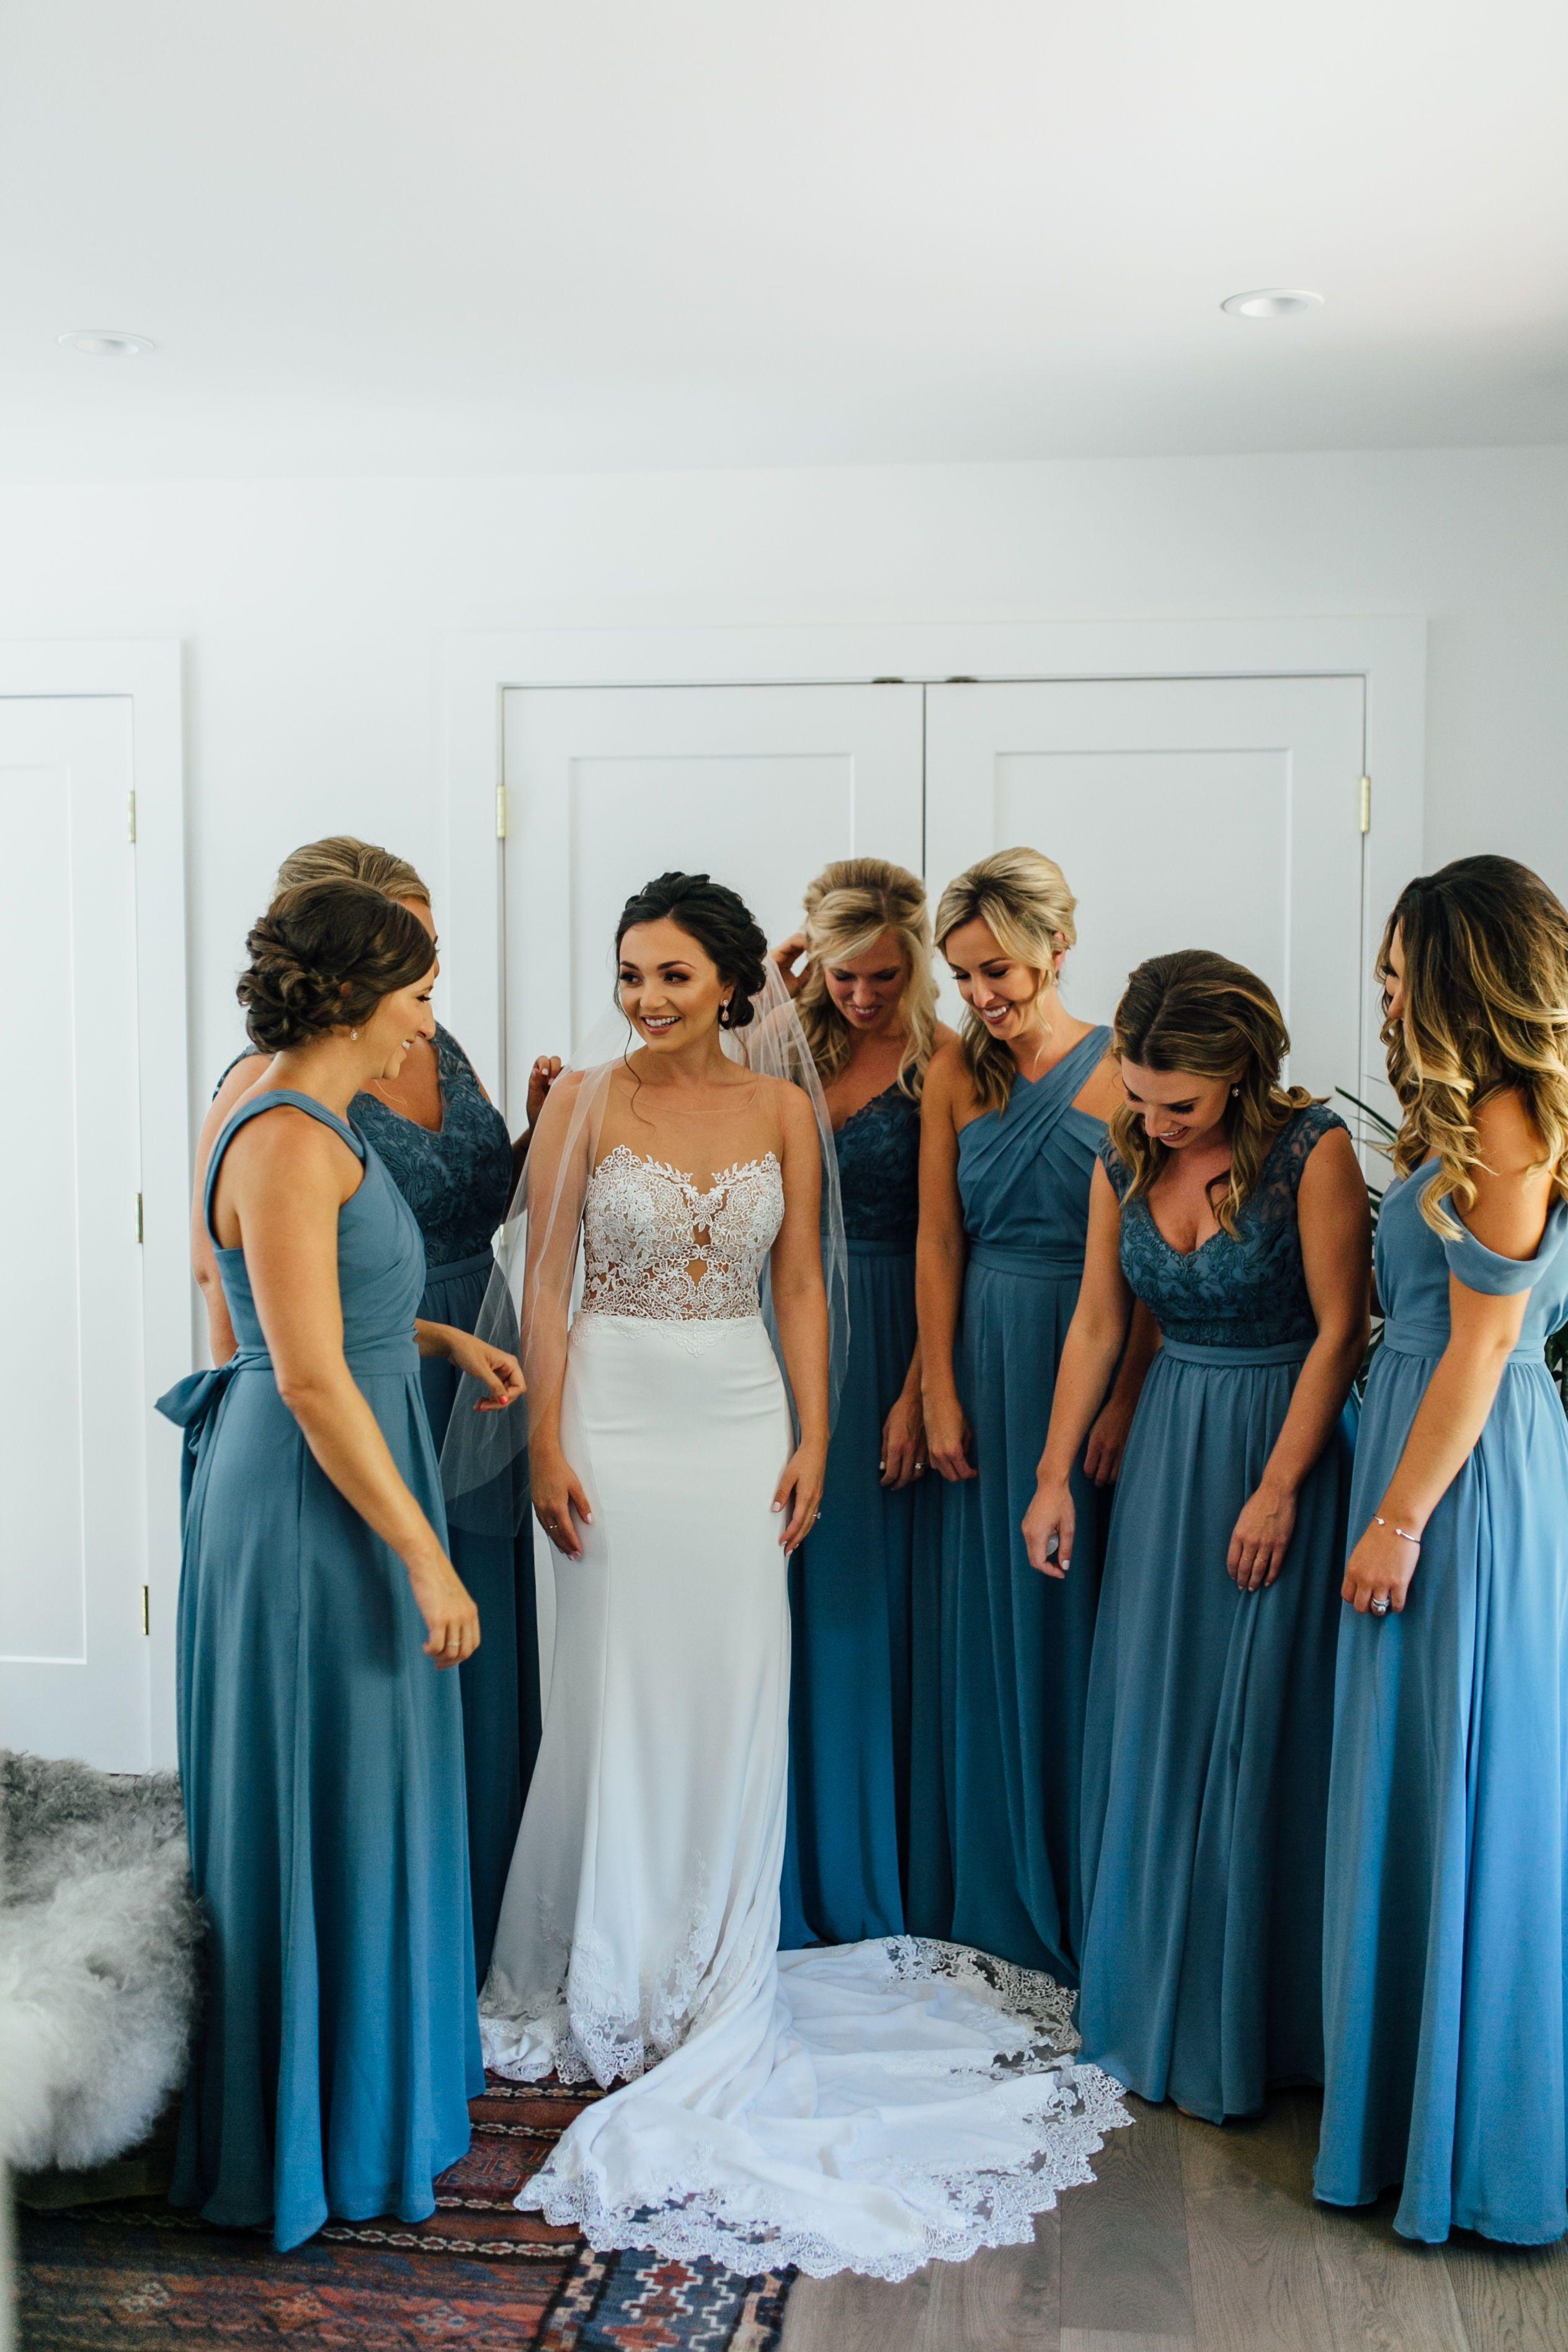 slate blue bridesmaids dresses, dusty